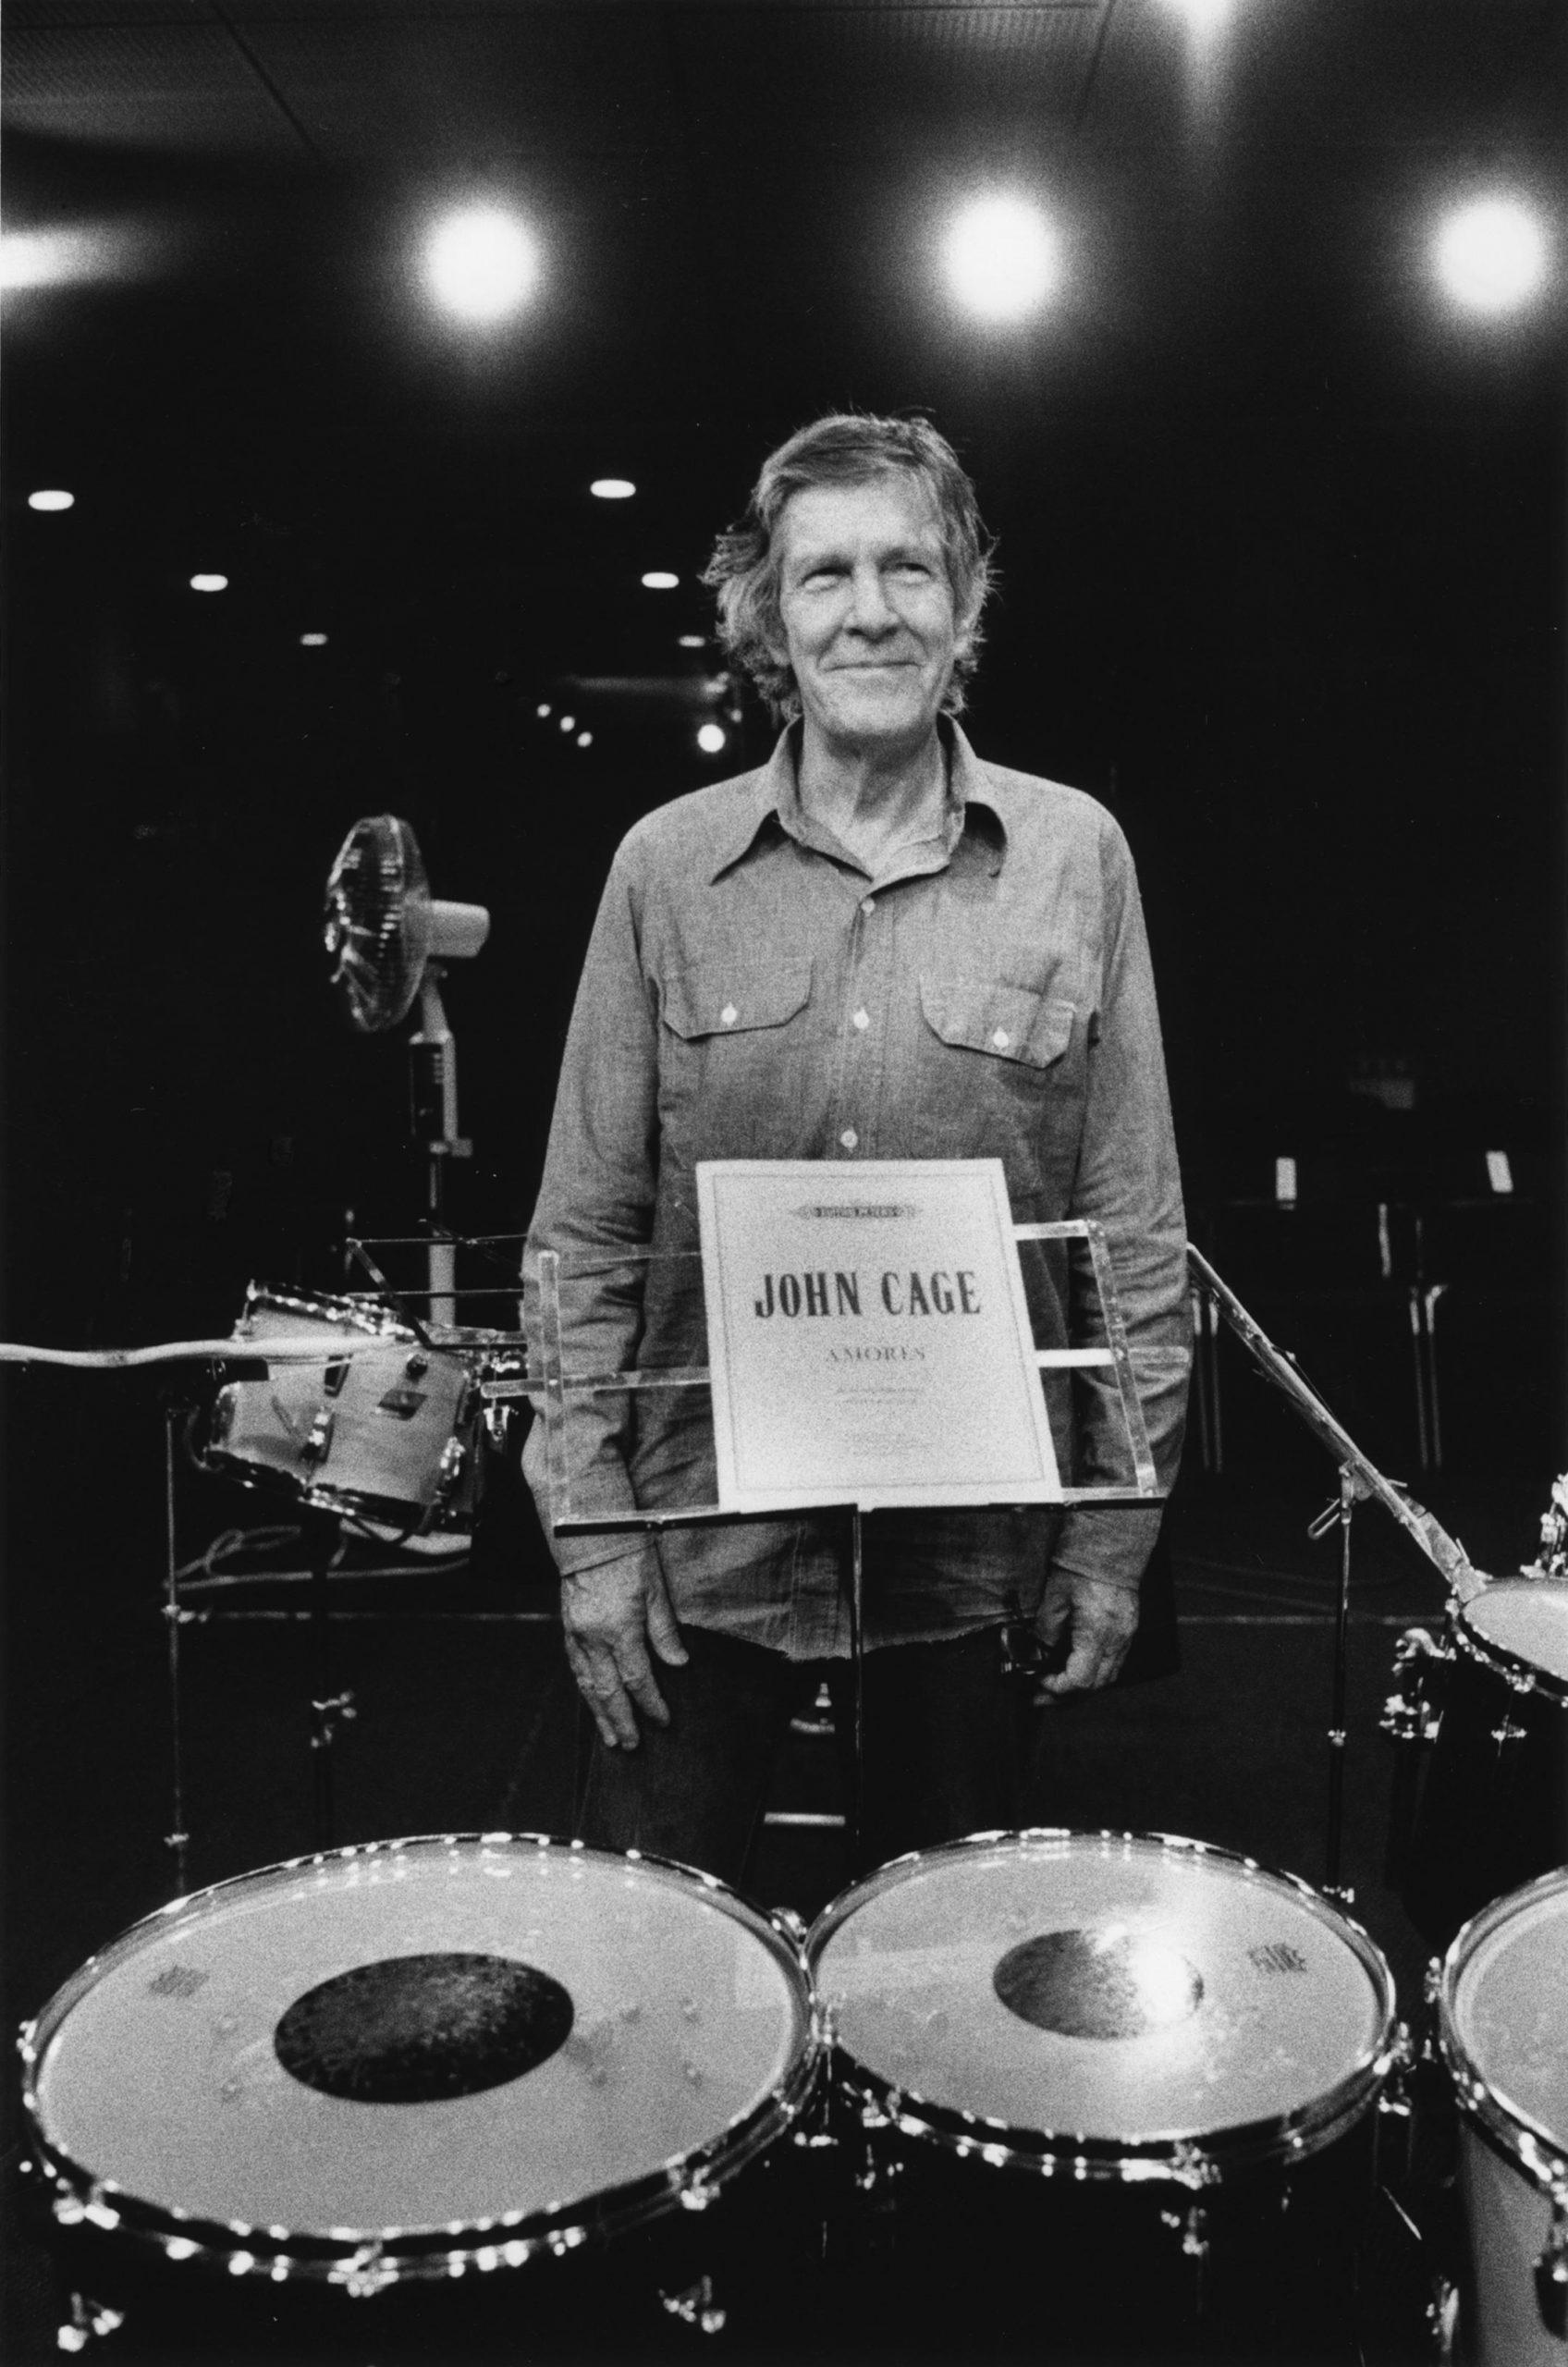 John Cage, 1986. Photo credit: Akira Kinoshita, courtesy of the John Cage Trust